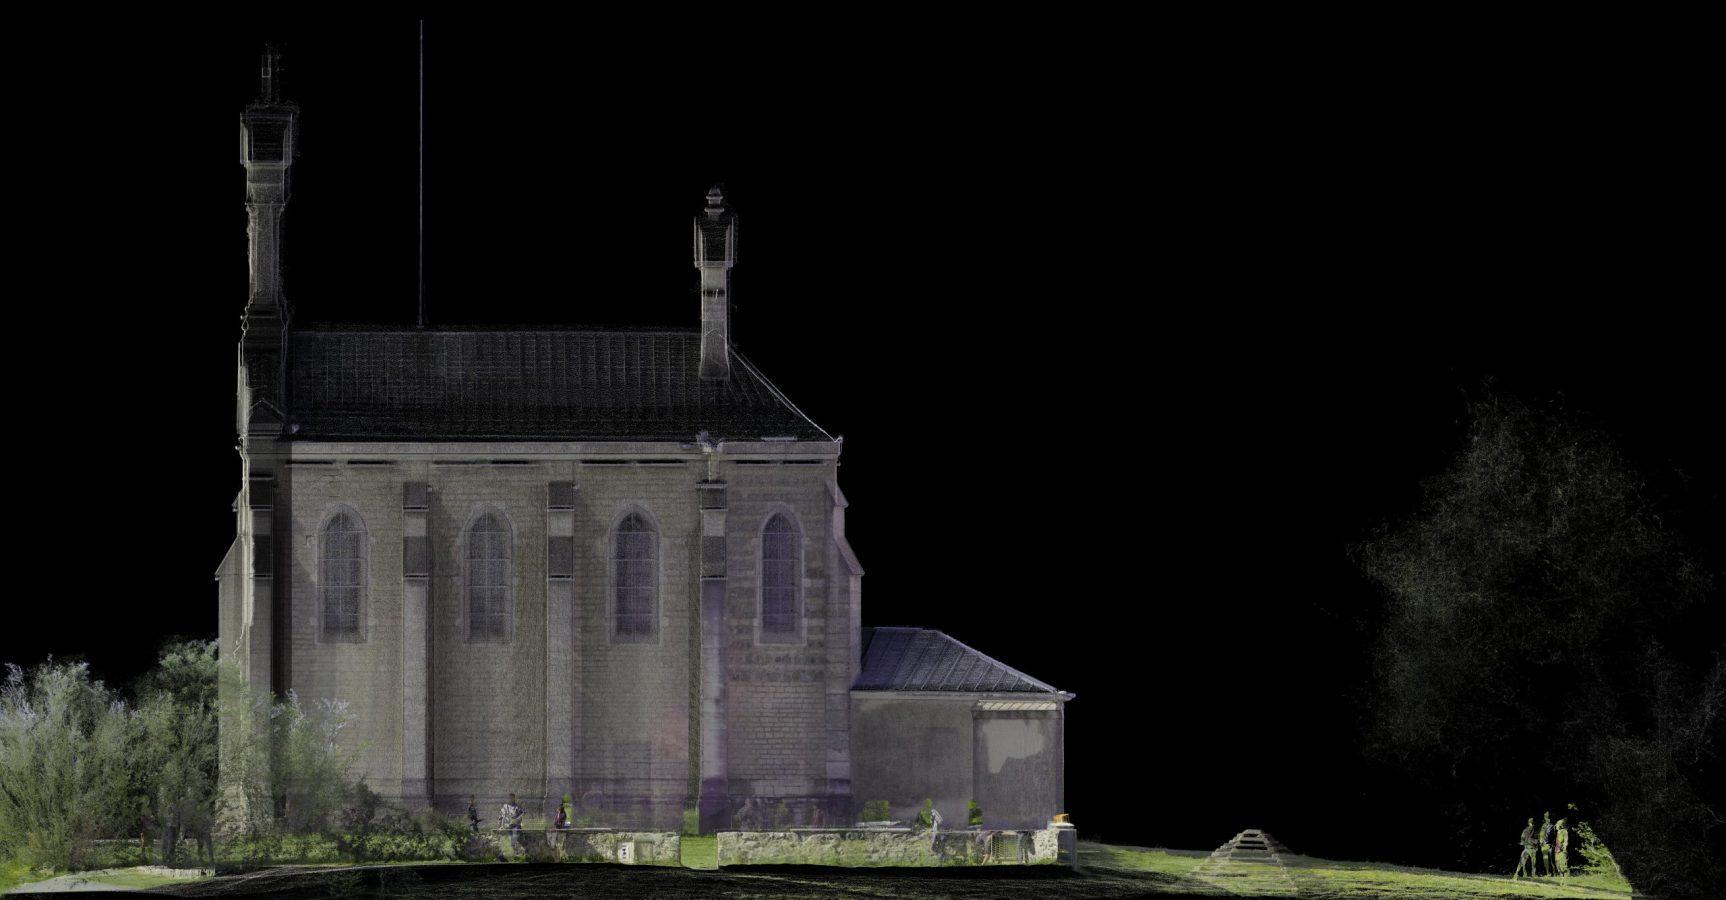 Orthophoto-nuagedepoint-lasergrammetrie-scan3d